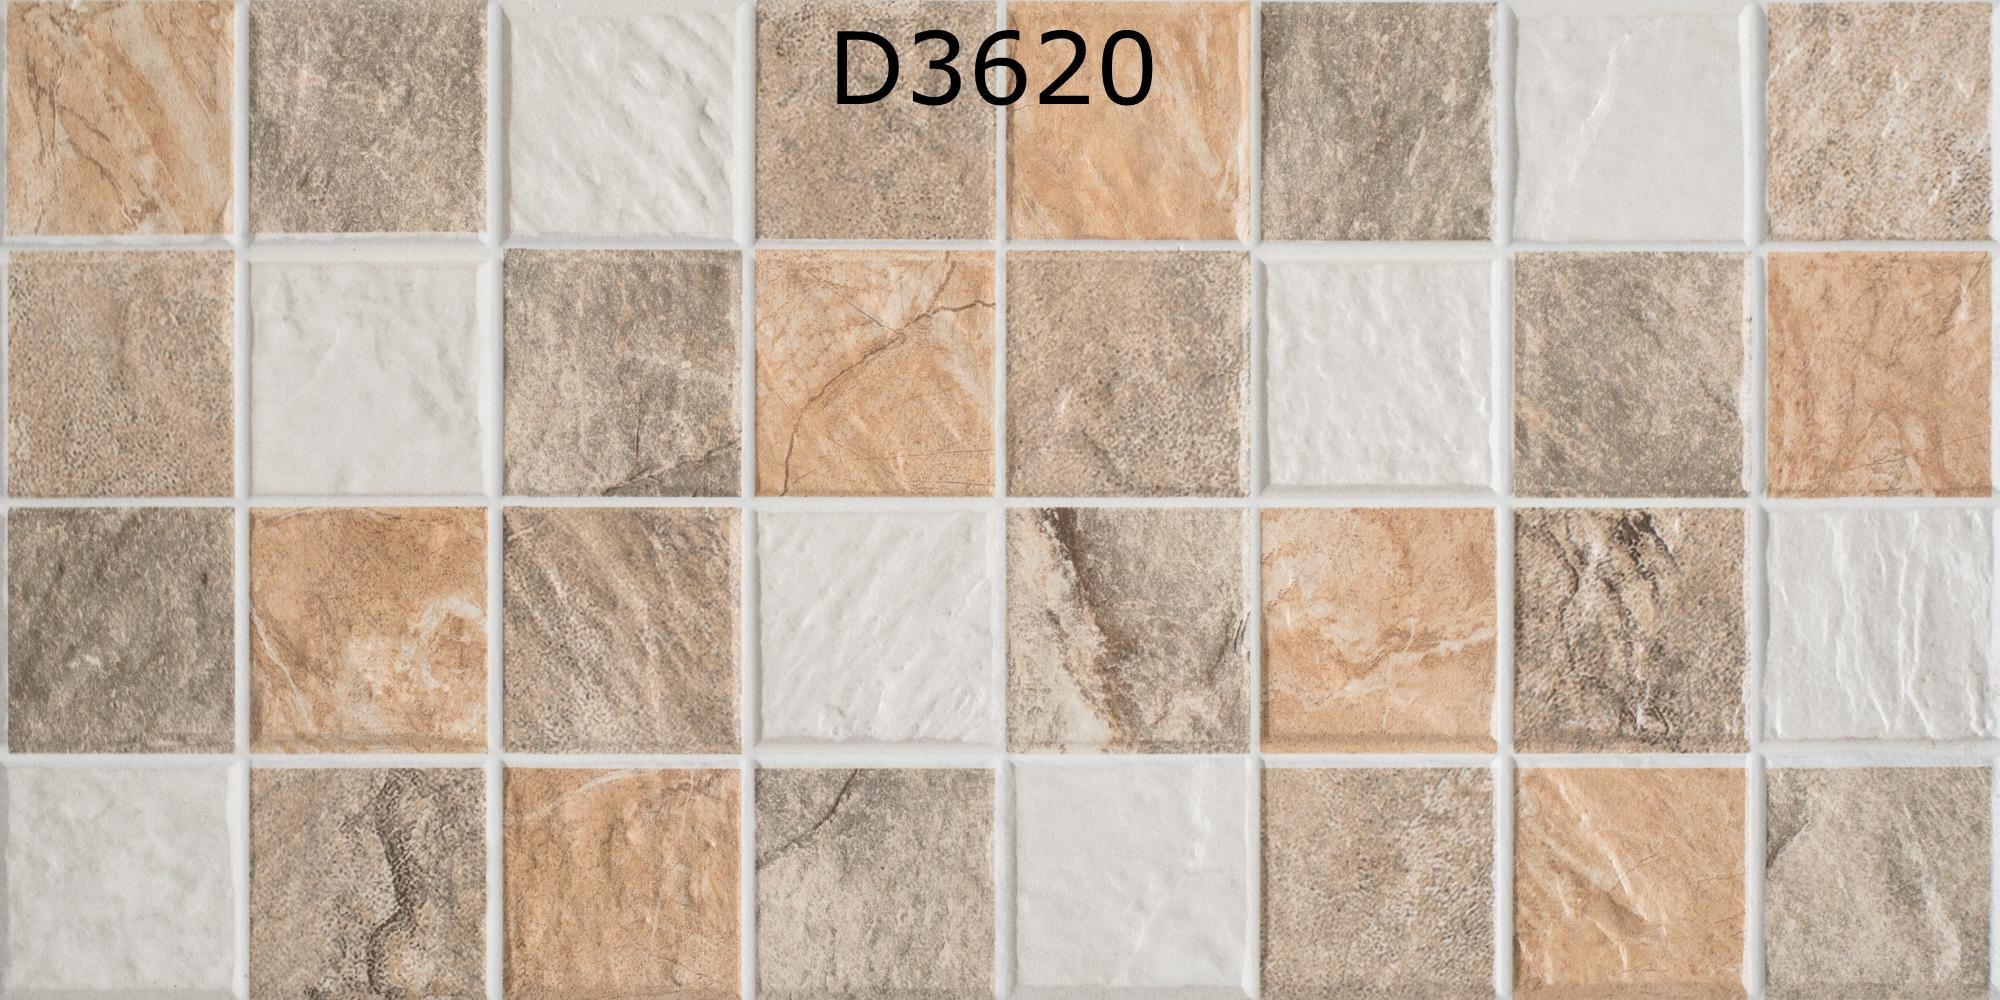 D3620